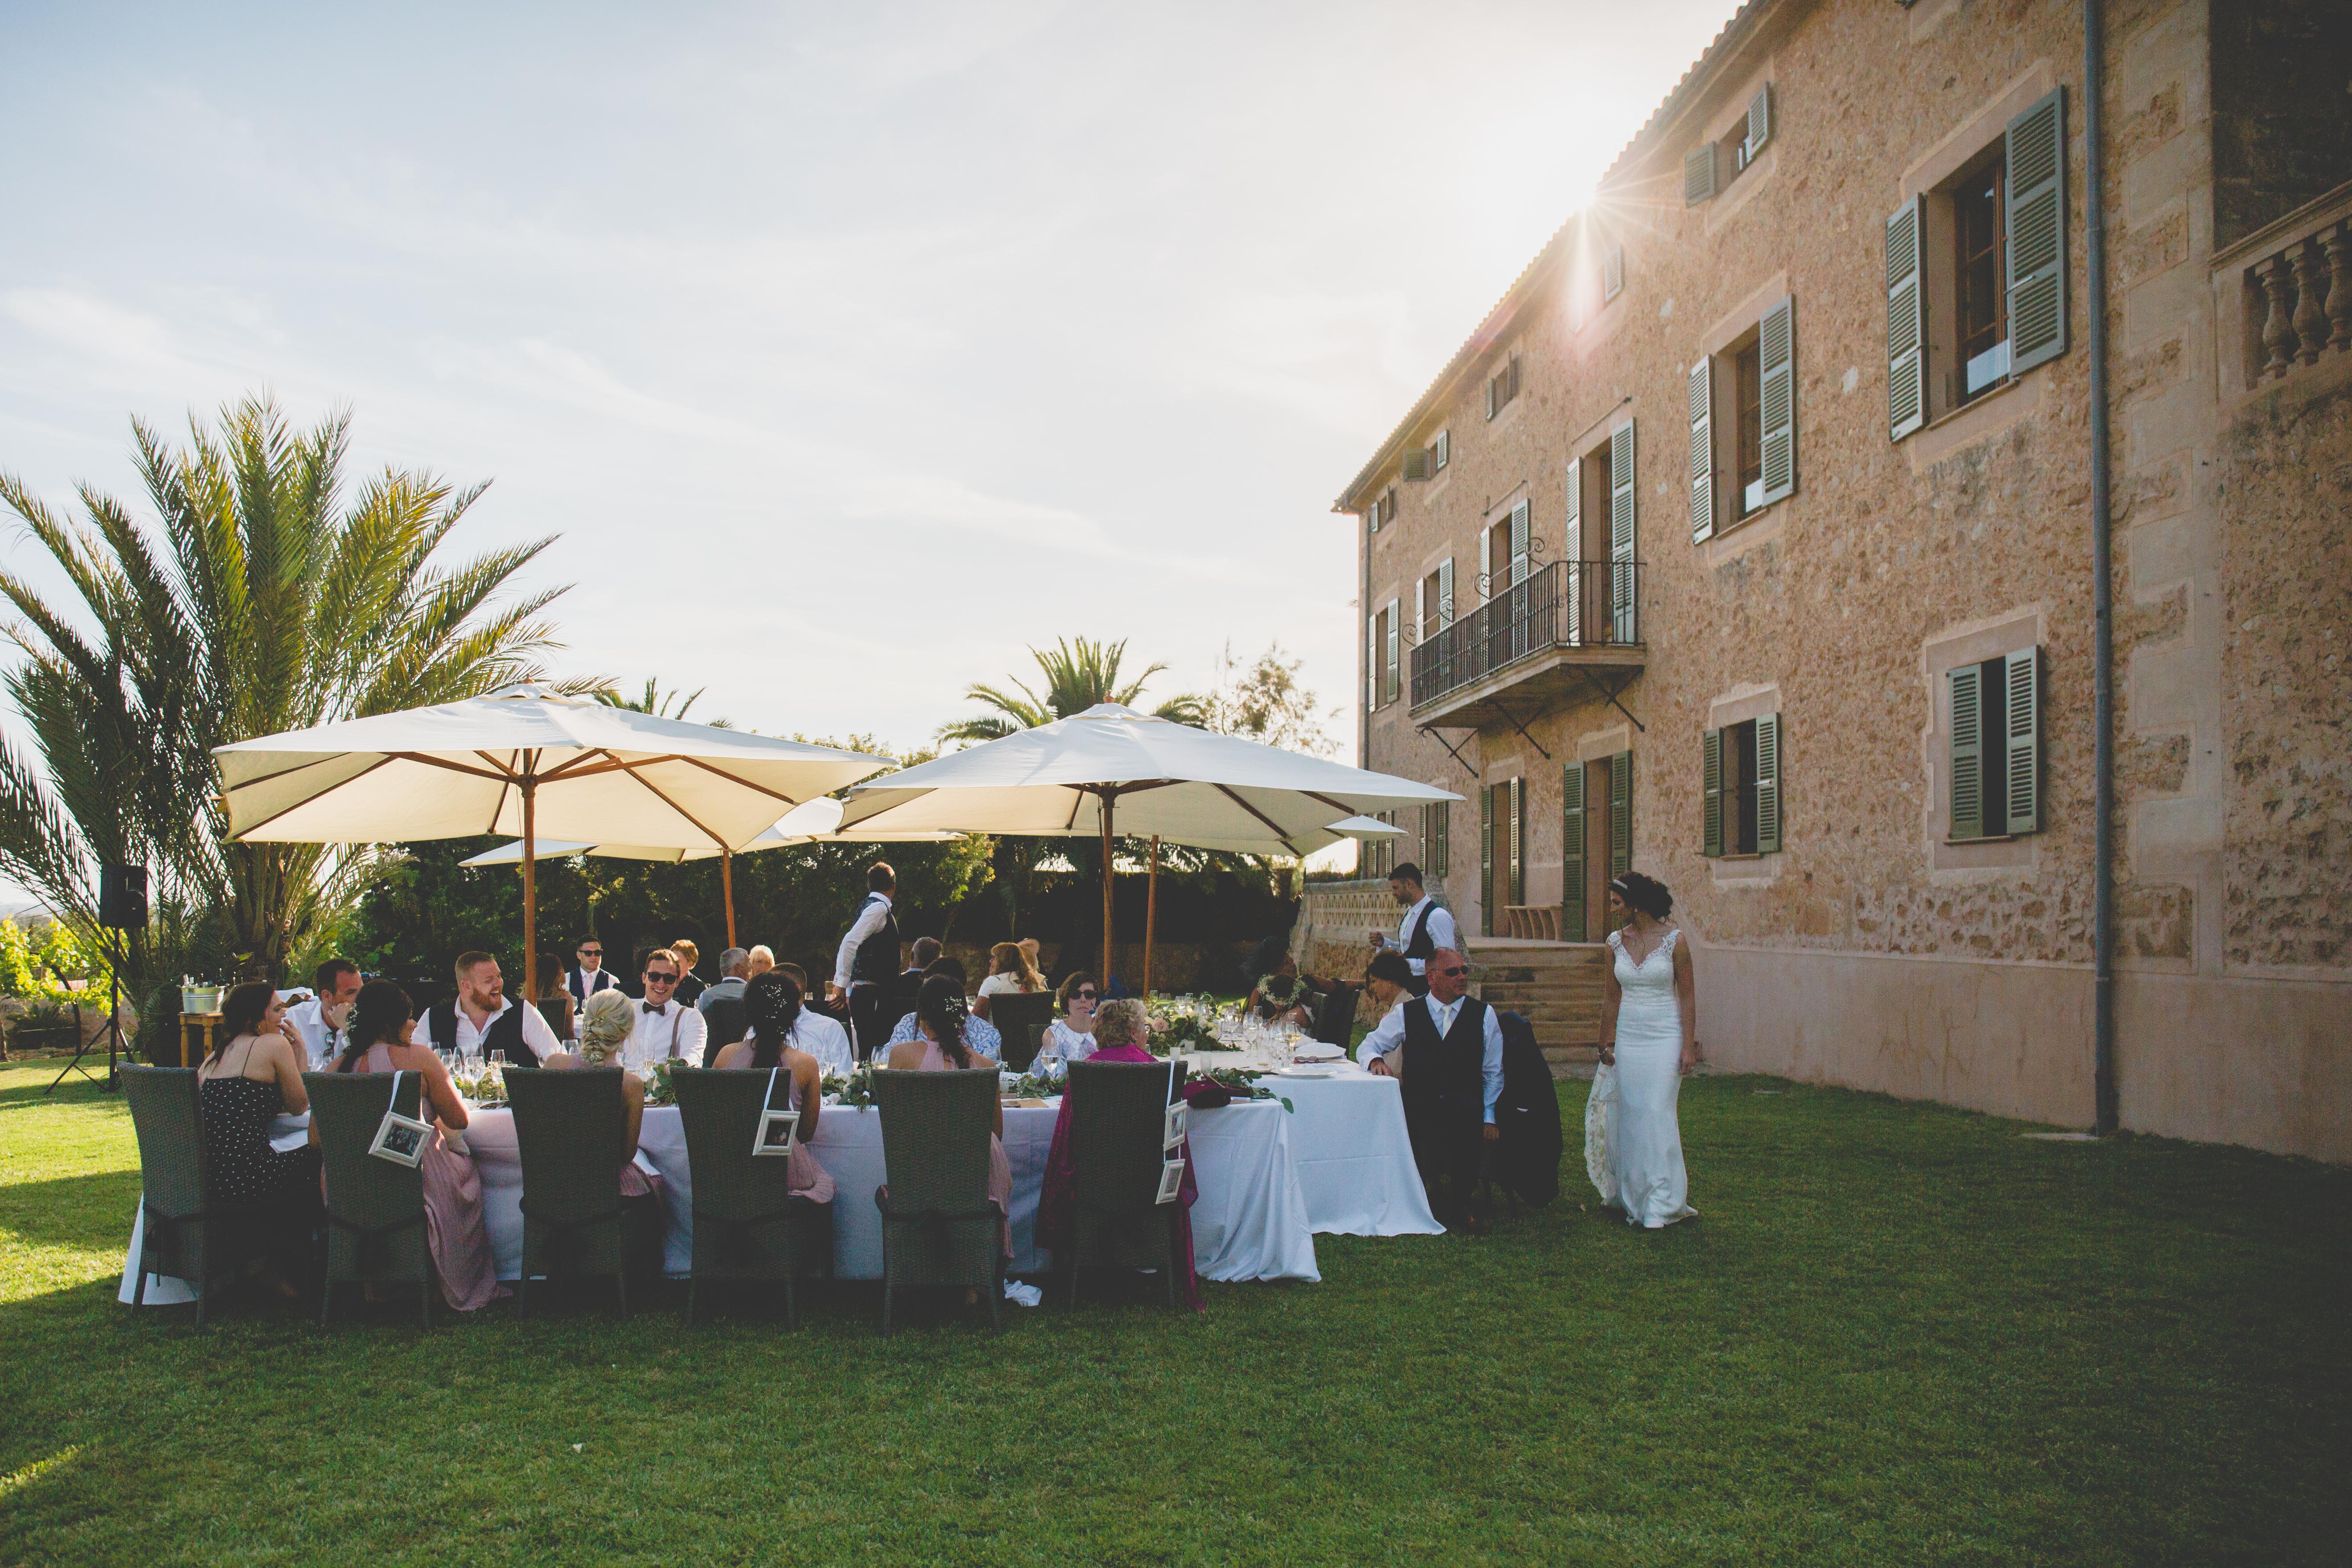 Wedding breakfast in the grounds of the fabulous finca